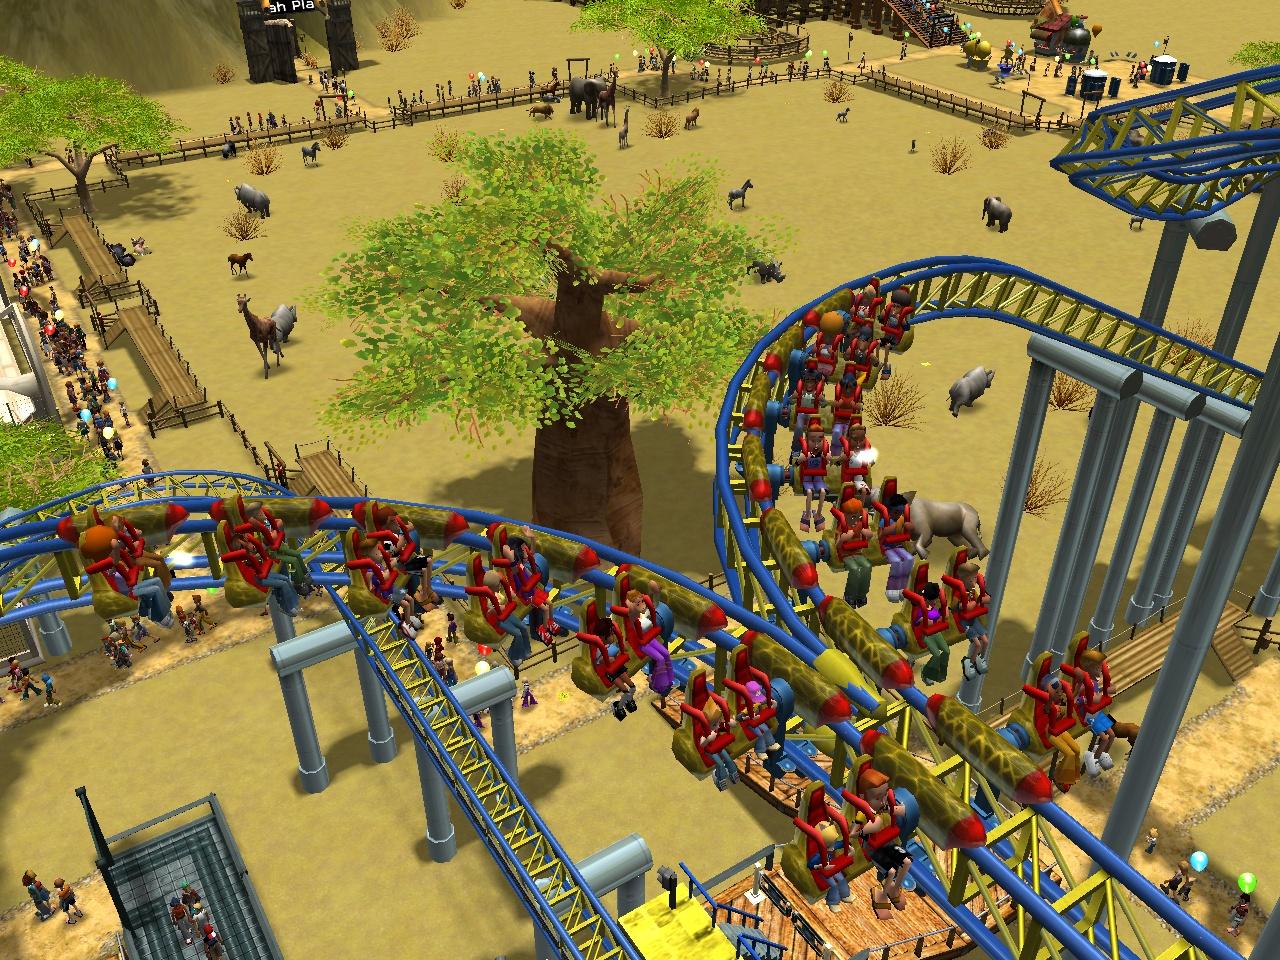 roller coaster games